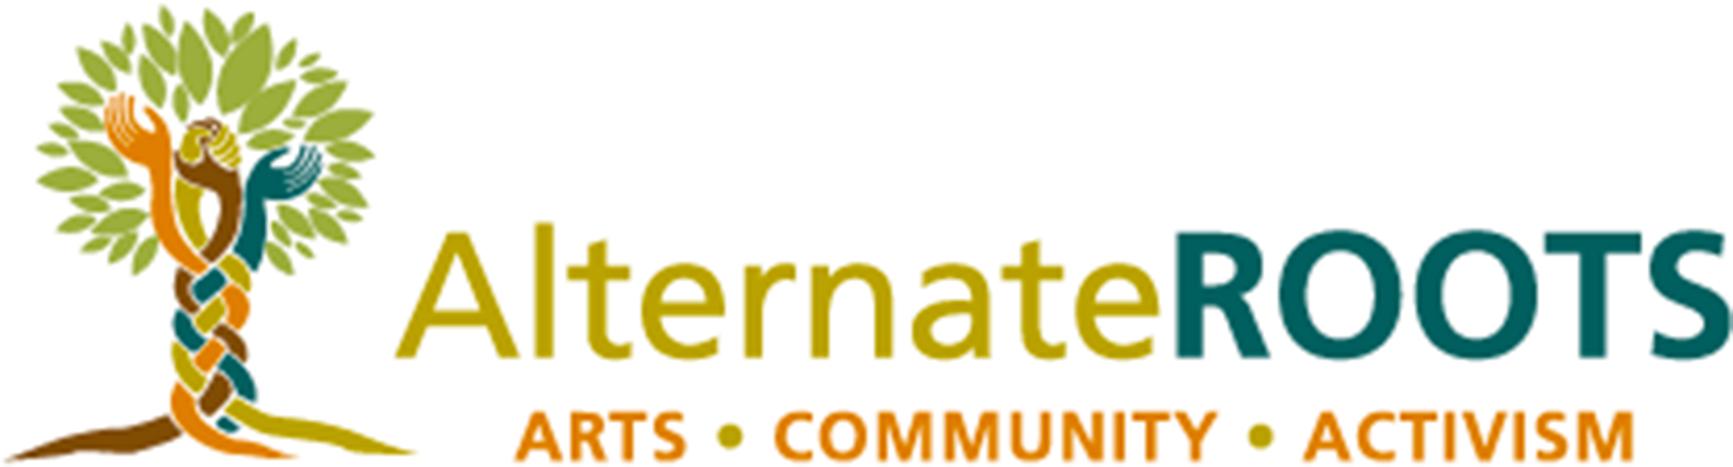 copy-AlternateROOTS_logo.png